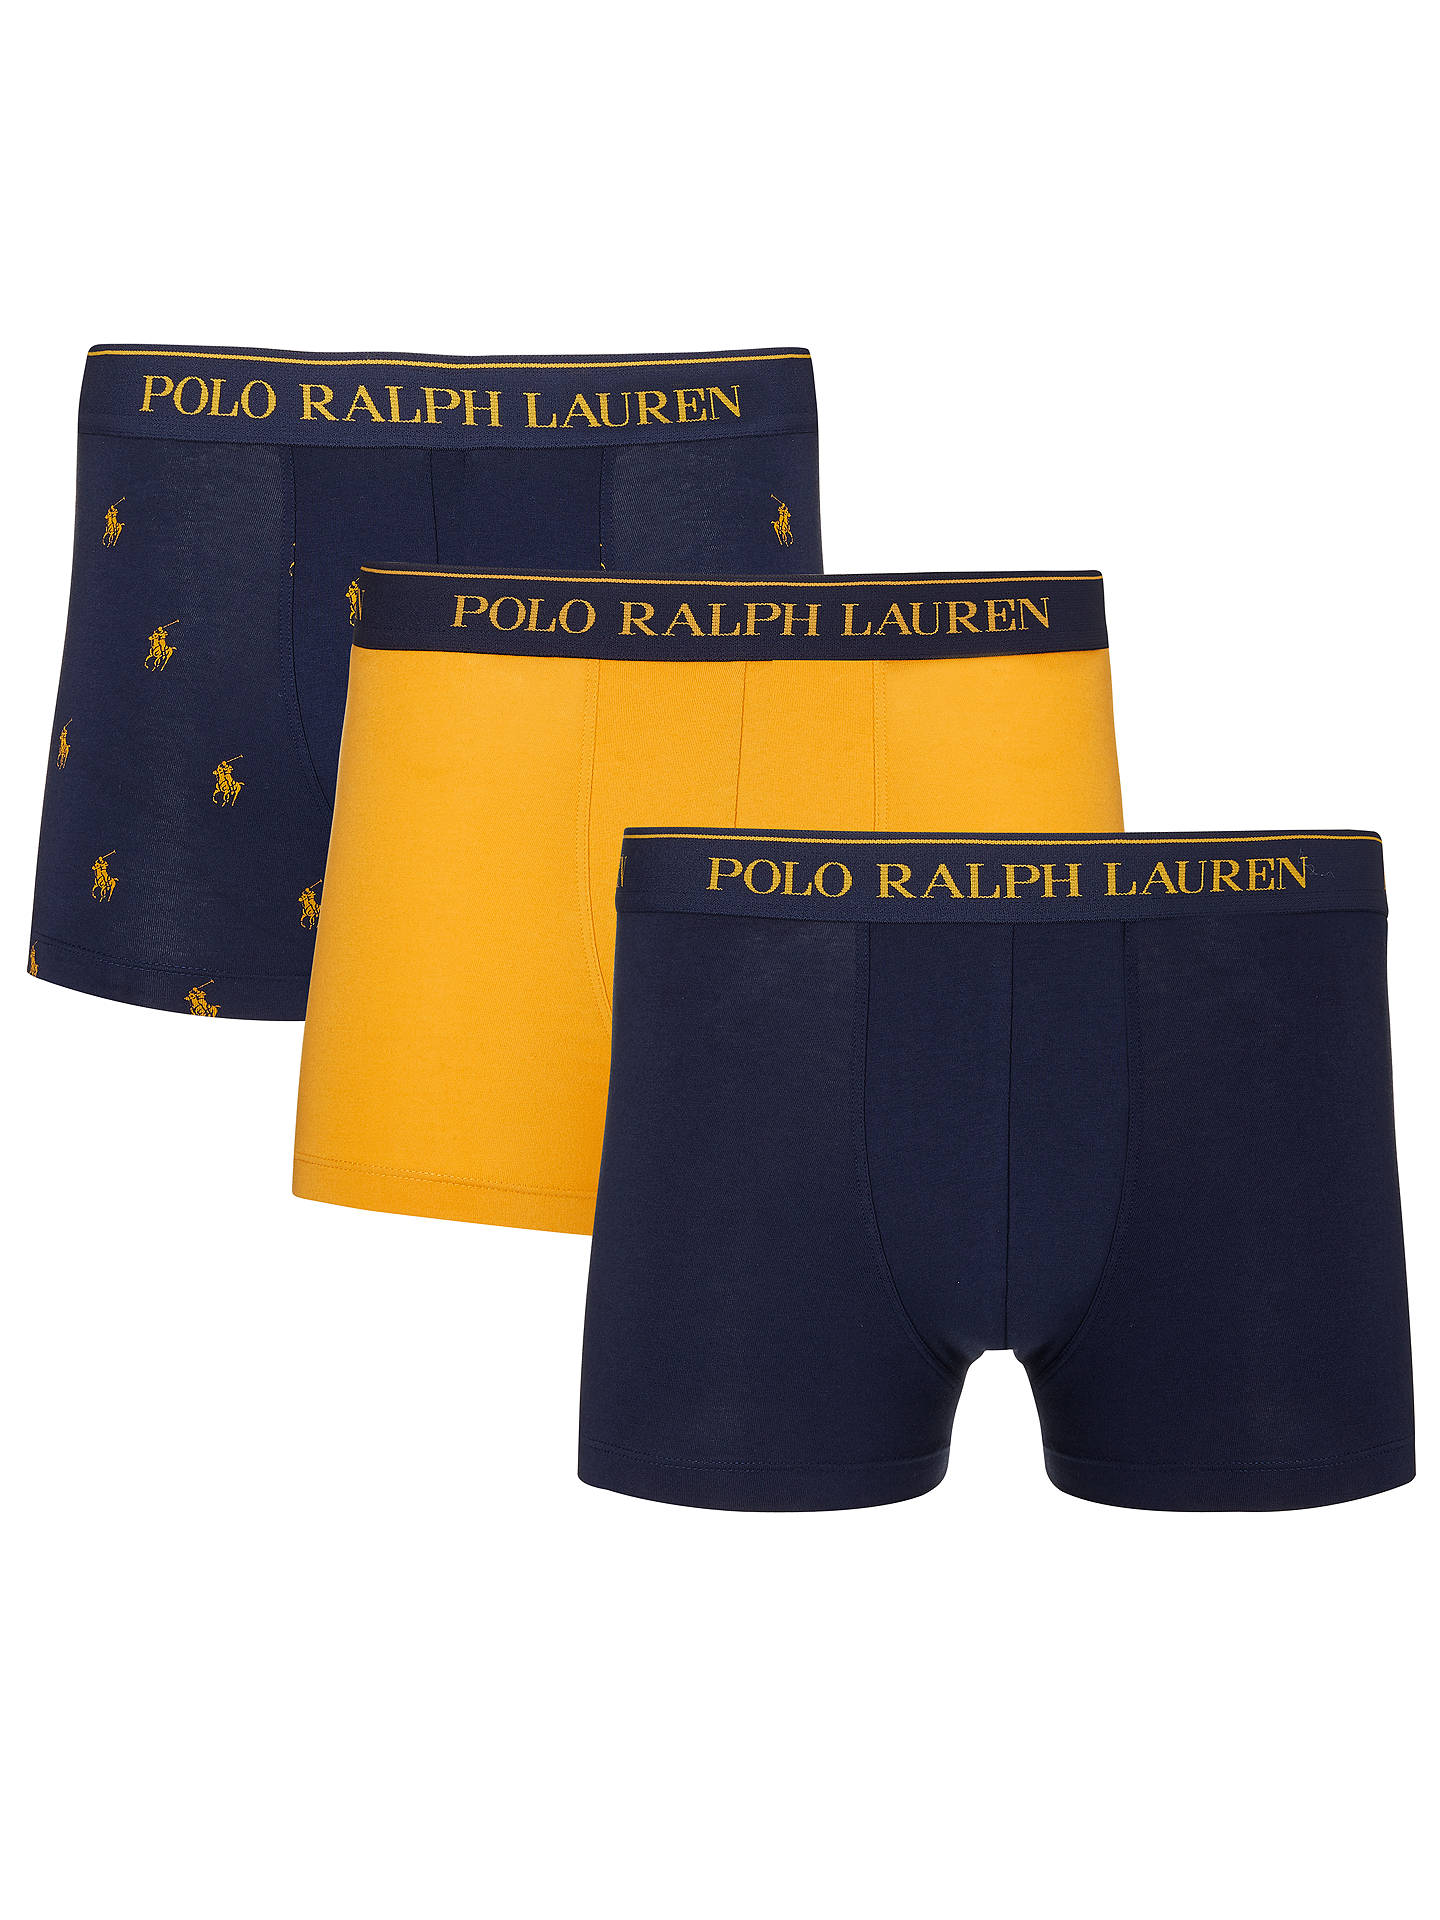 dc4b22562741 Polo Ralph Lauren Pony Logo Trunks, Pack of 3, Navy/Yellow at John ...